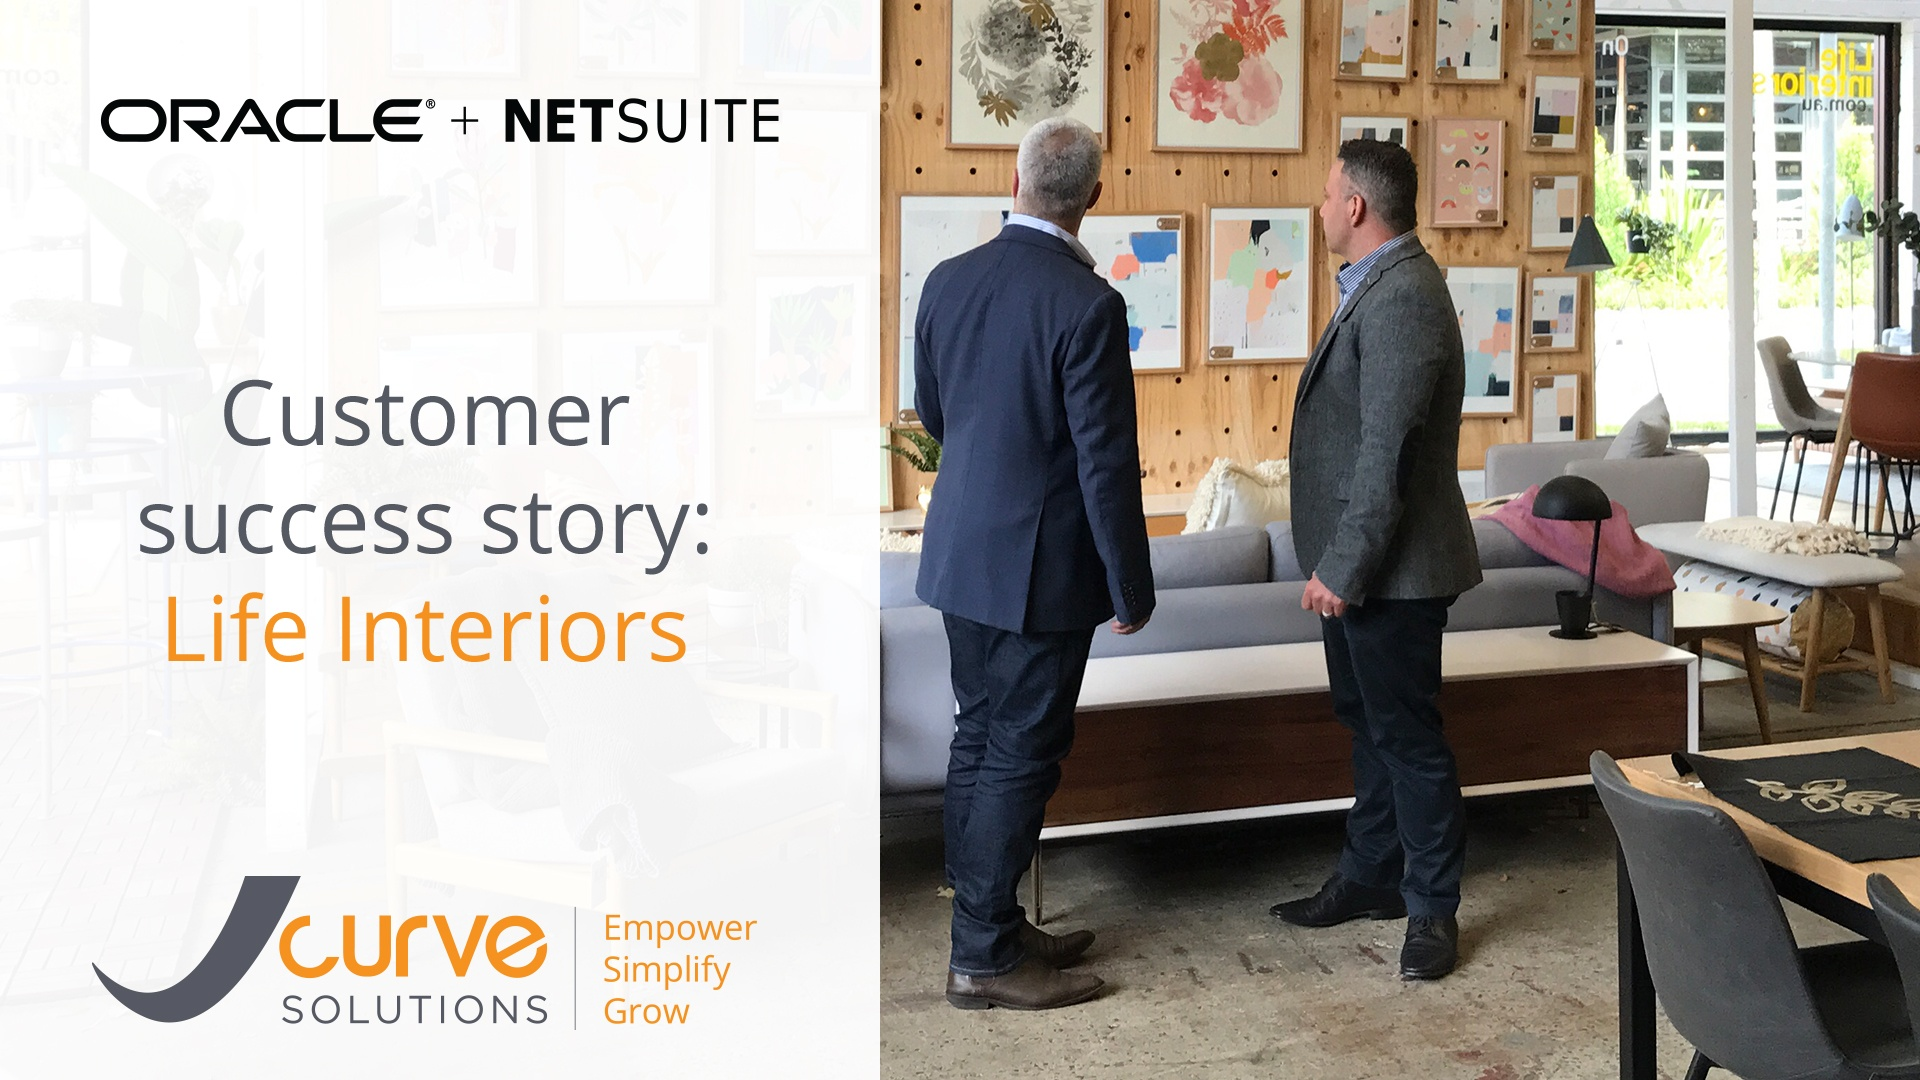 Customer-Success-Story-Video-Life-Interiors-LinkedIn.jpg